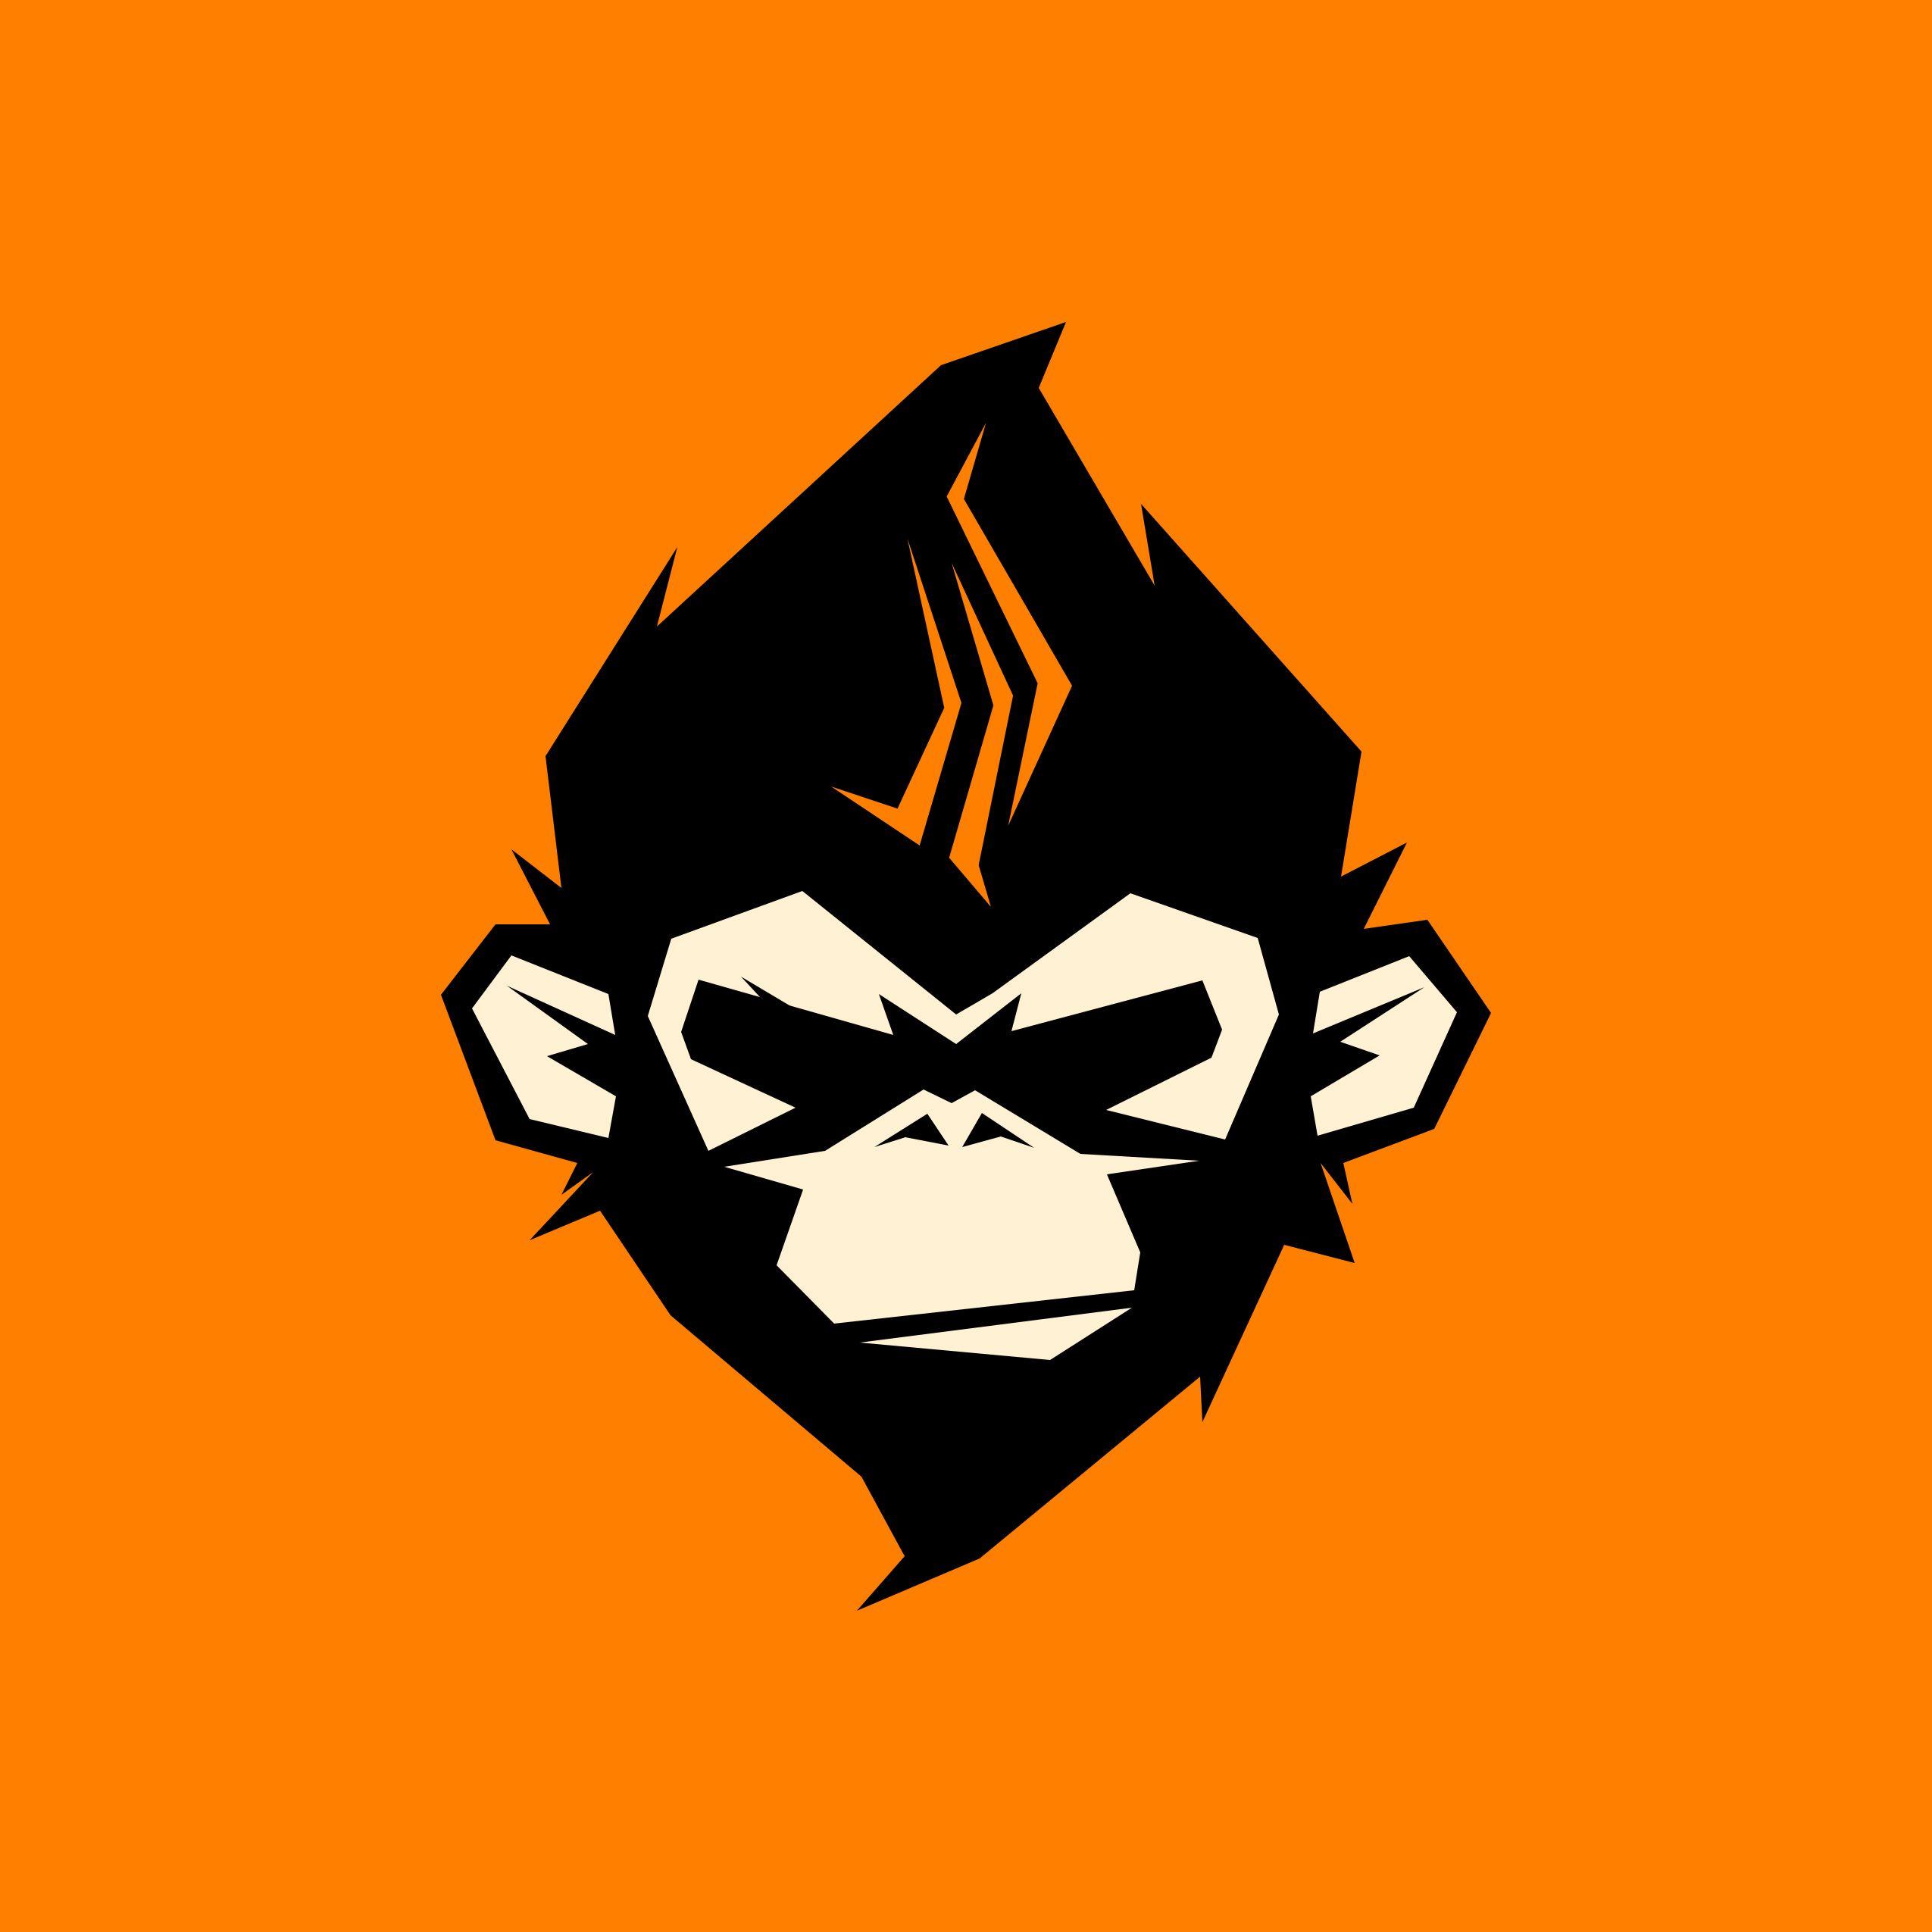 Monkey Logo > Jacob Malabanan On Behance